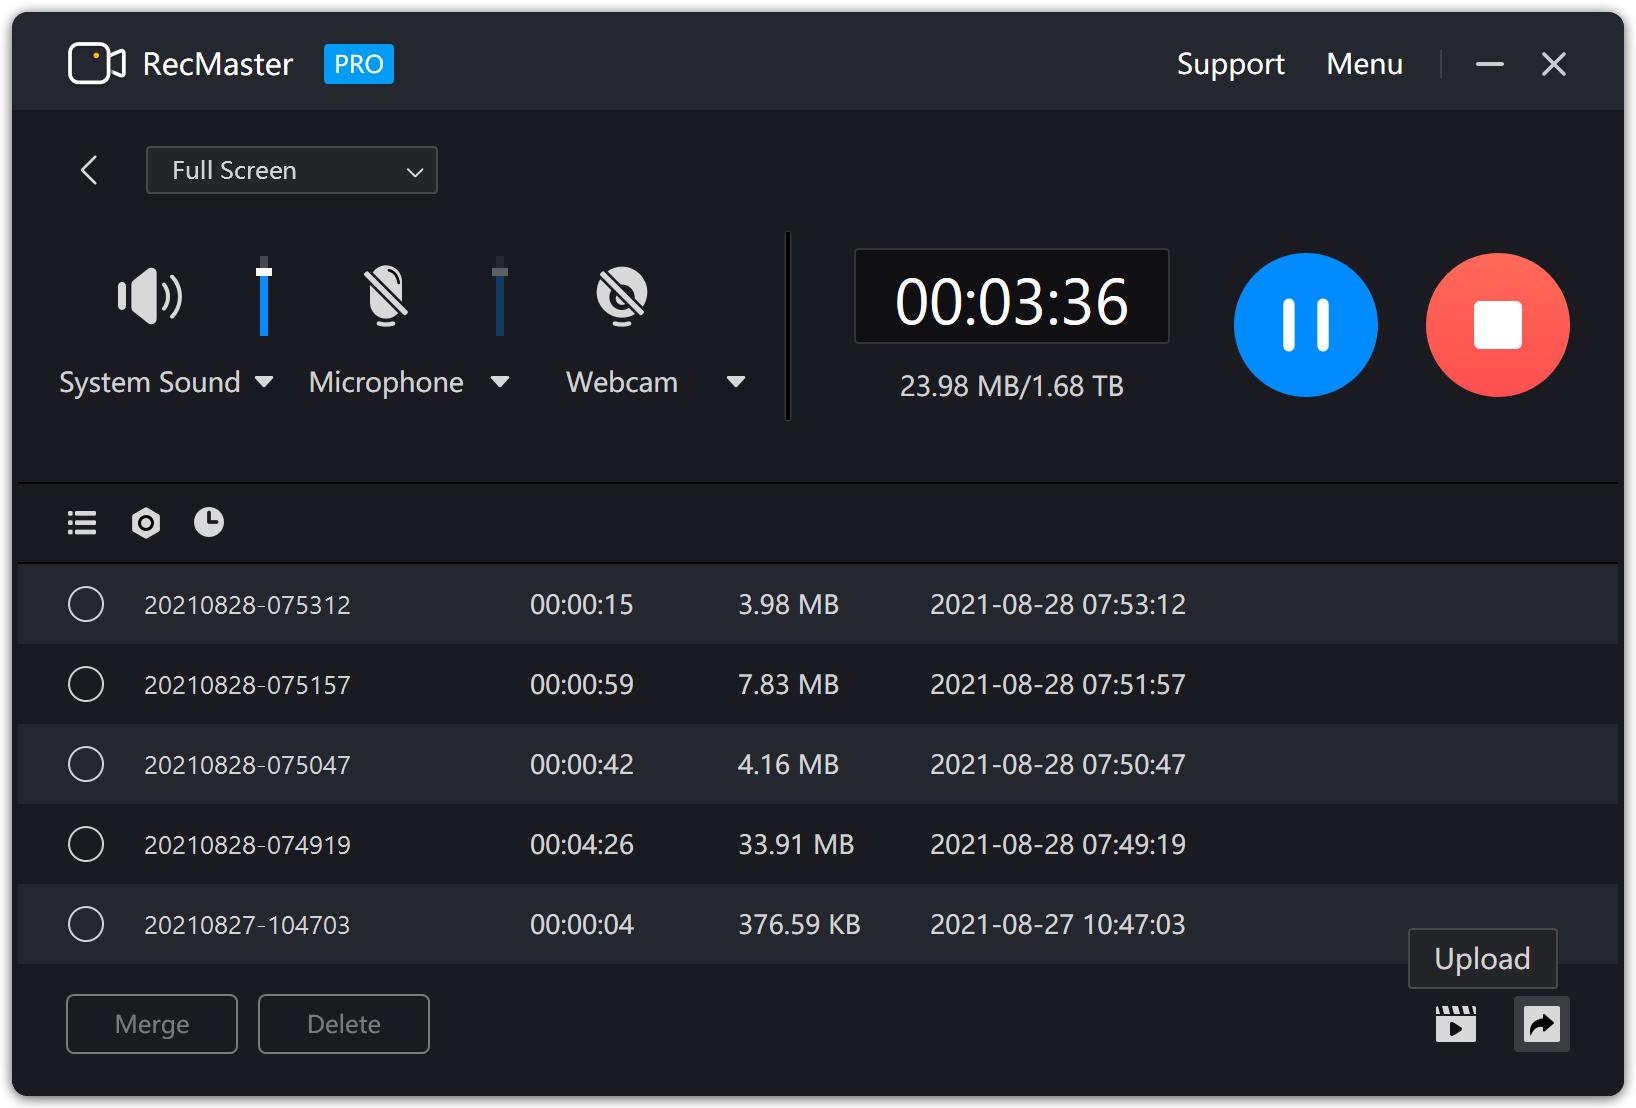 RecMaster - Screen Recorder (Lifetime License), Video Capture Software Screenshot